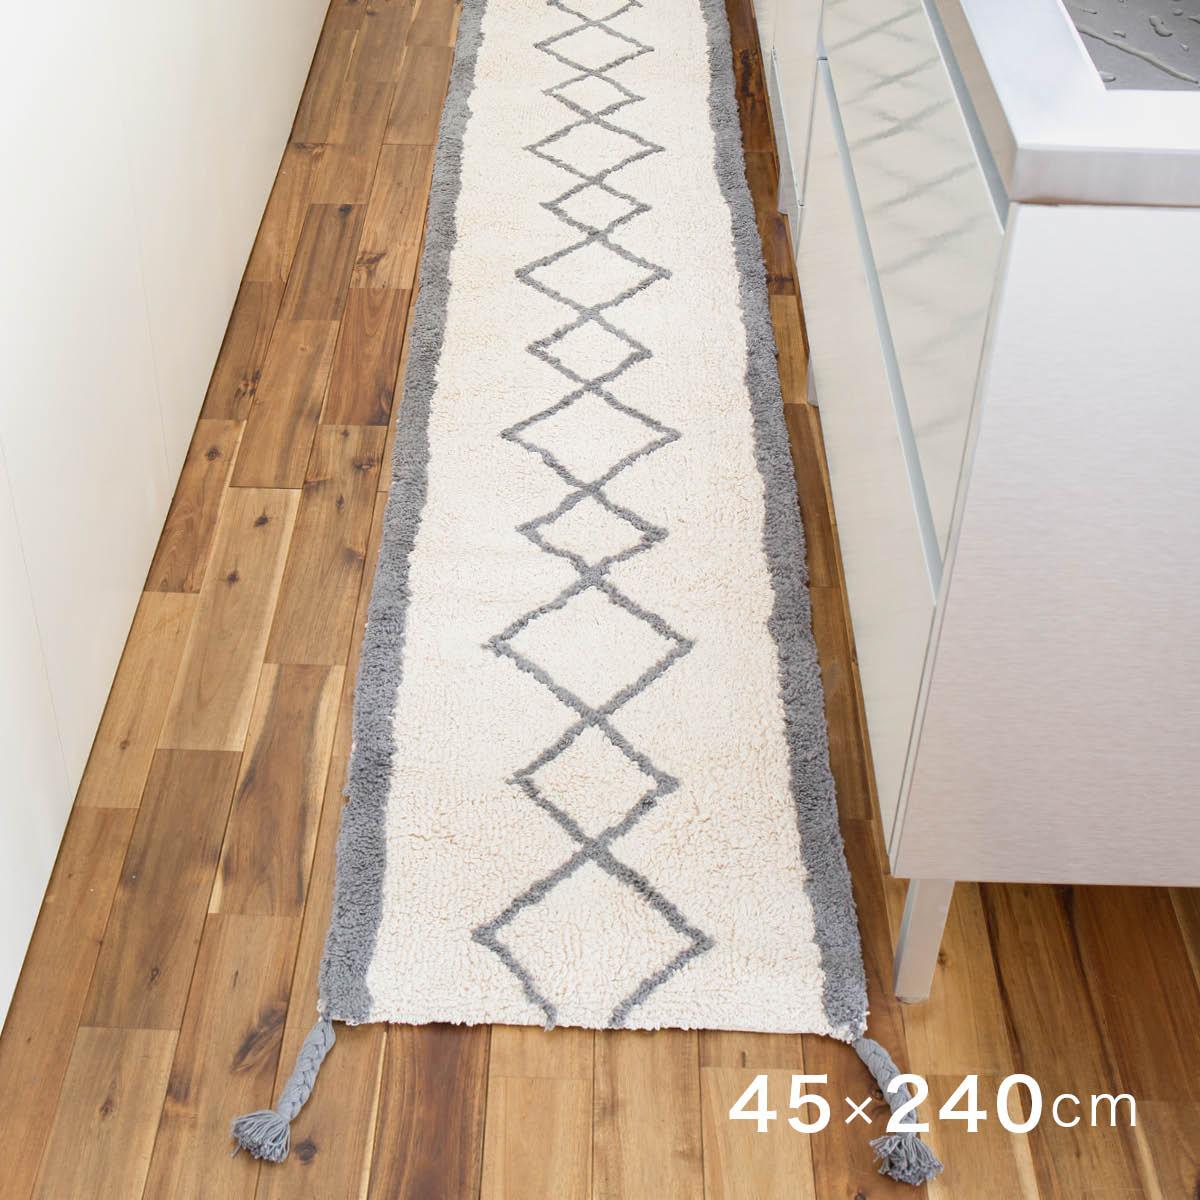 240cm 洗える キッチン 床 マット[b2c ダイヤ キッチンマット L|オーガニックコットン]#SL_KT